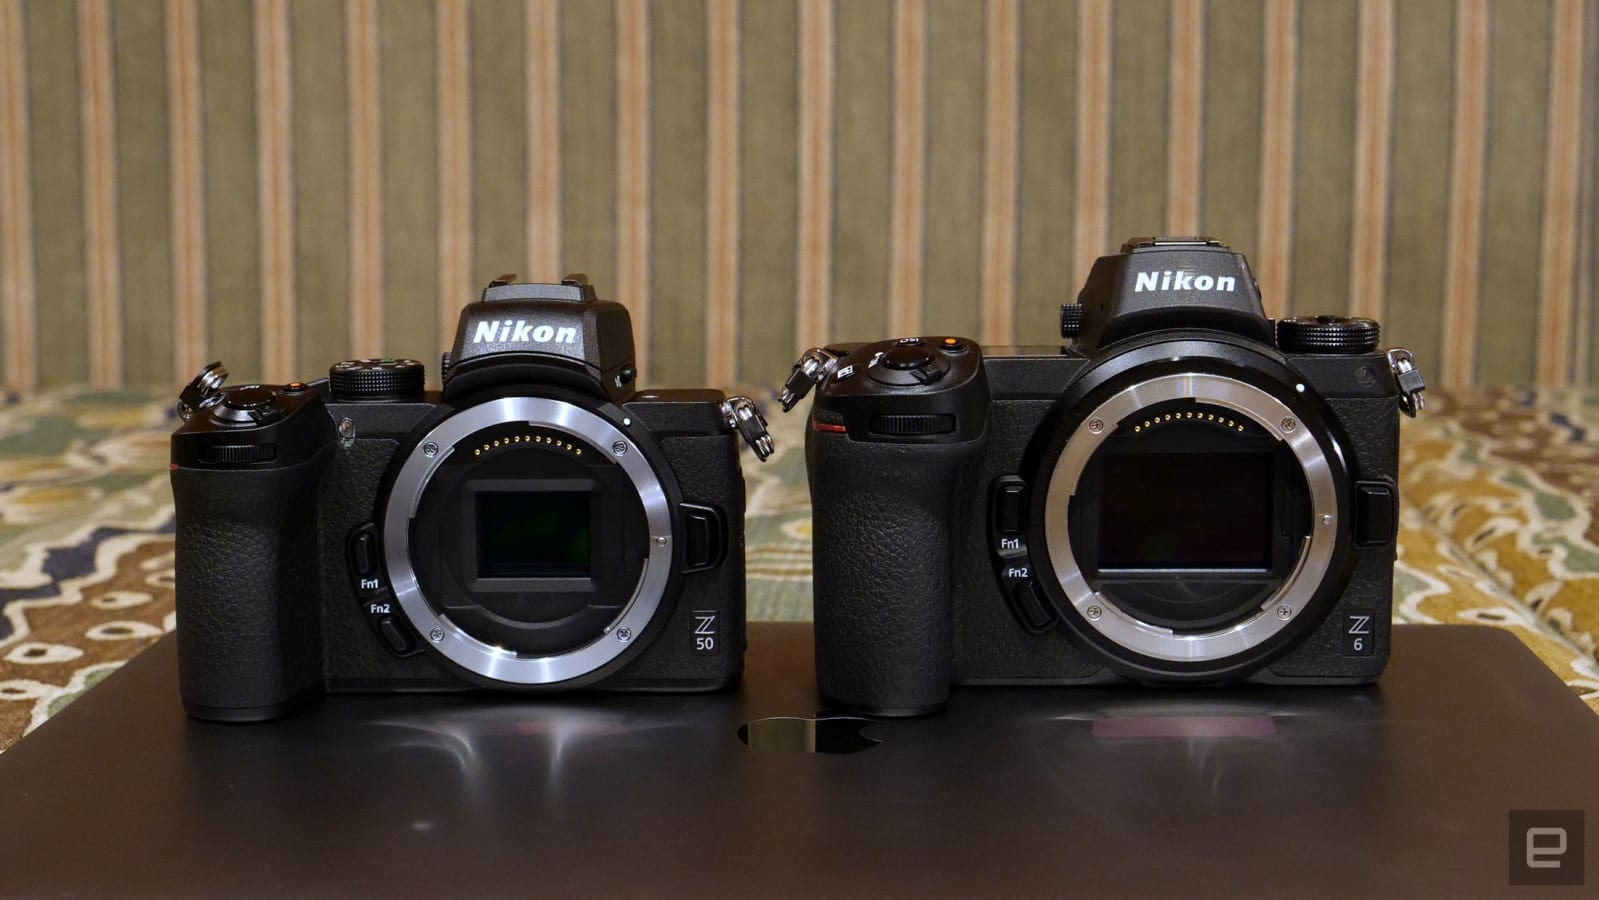 Nikon Z50 APC mirrorless camera review